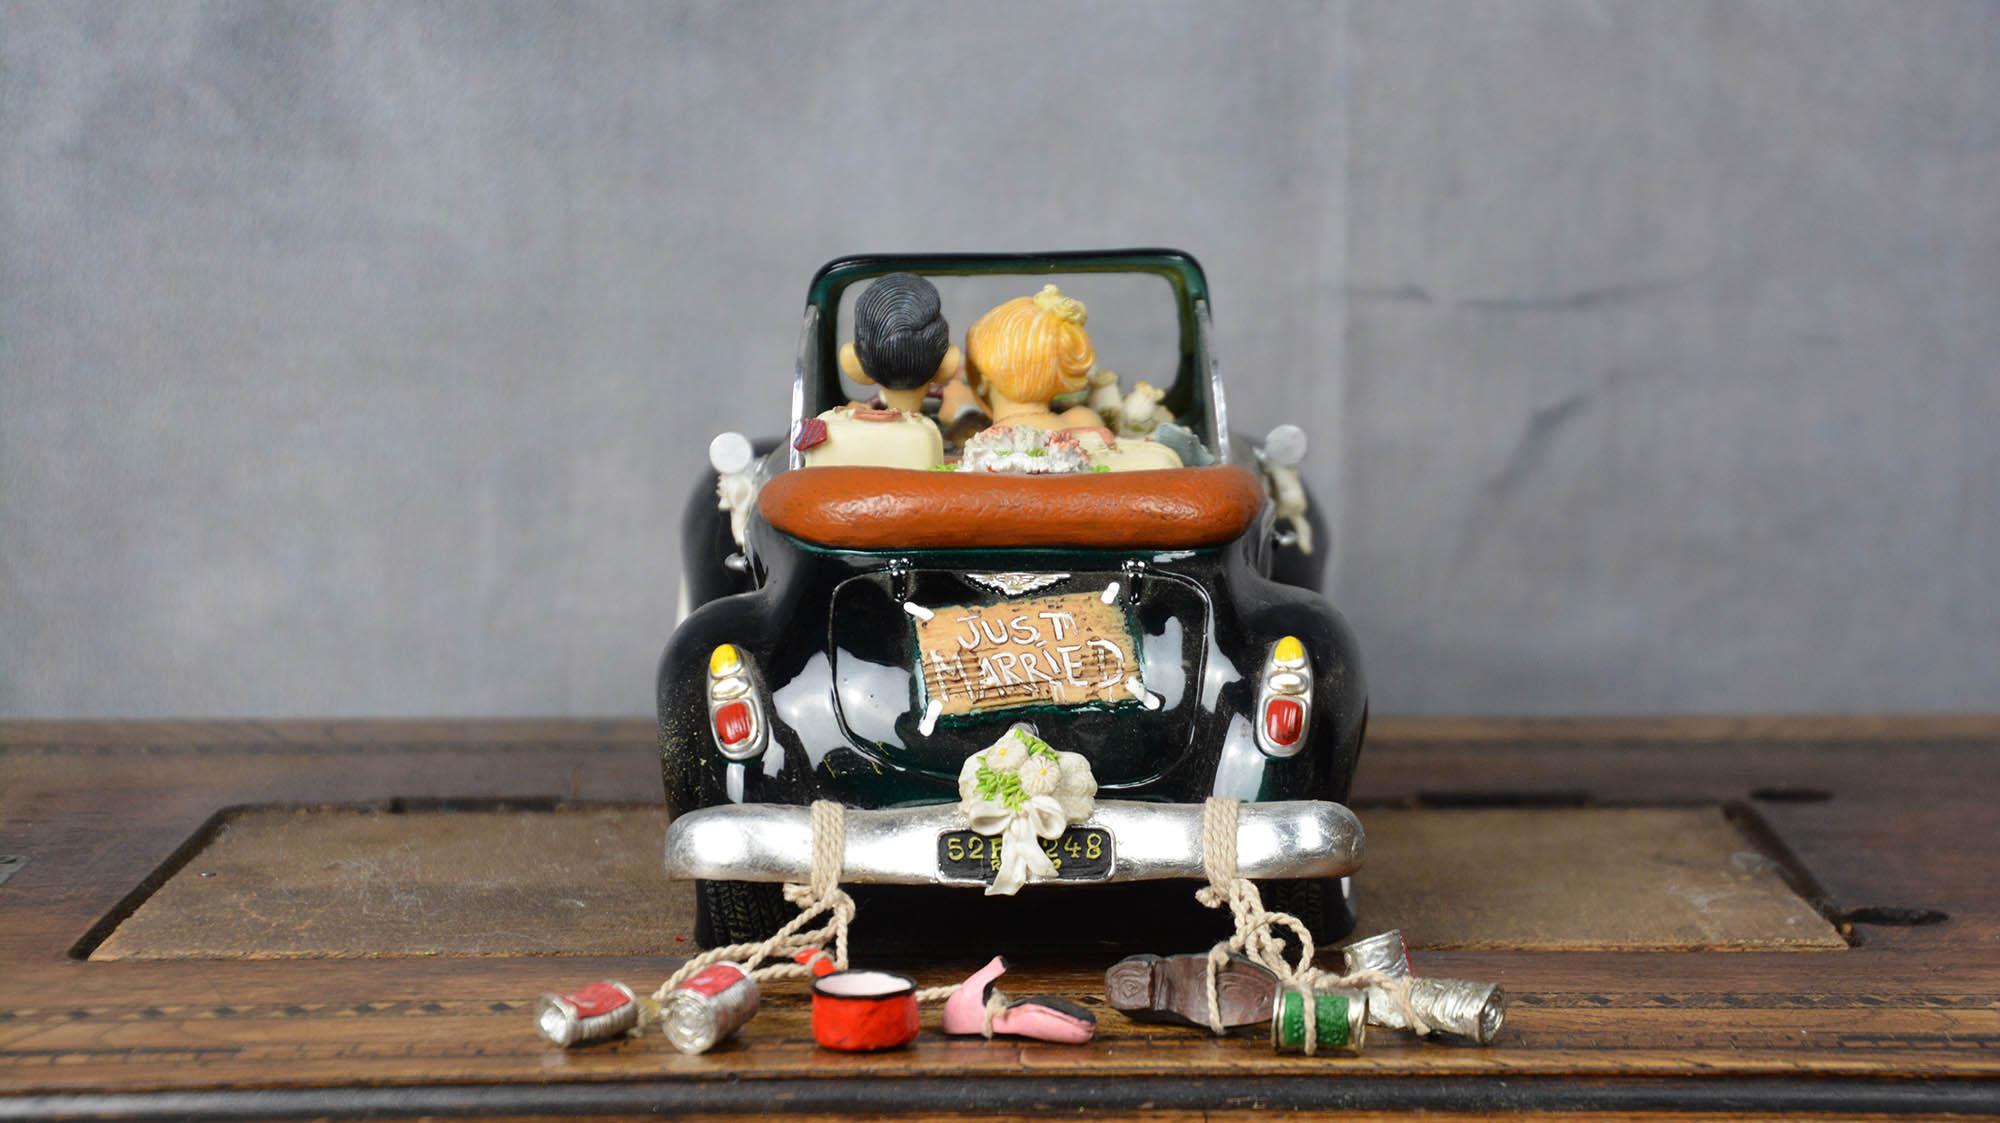 boutique figurine piece artisanale vehicule maries parodie